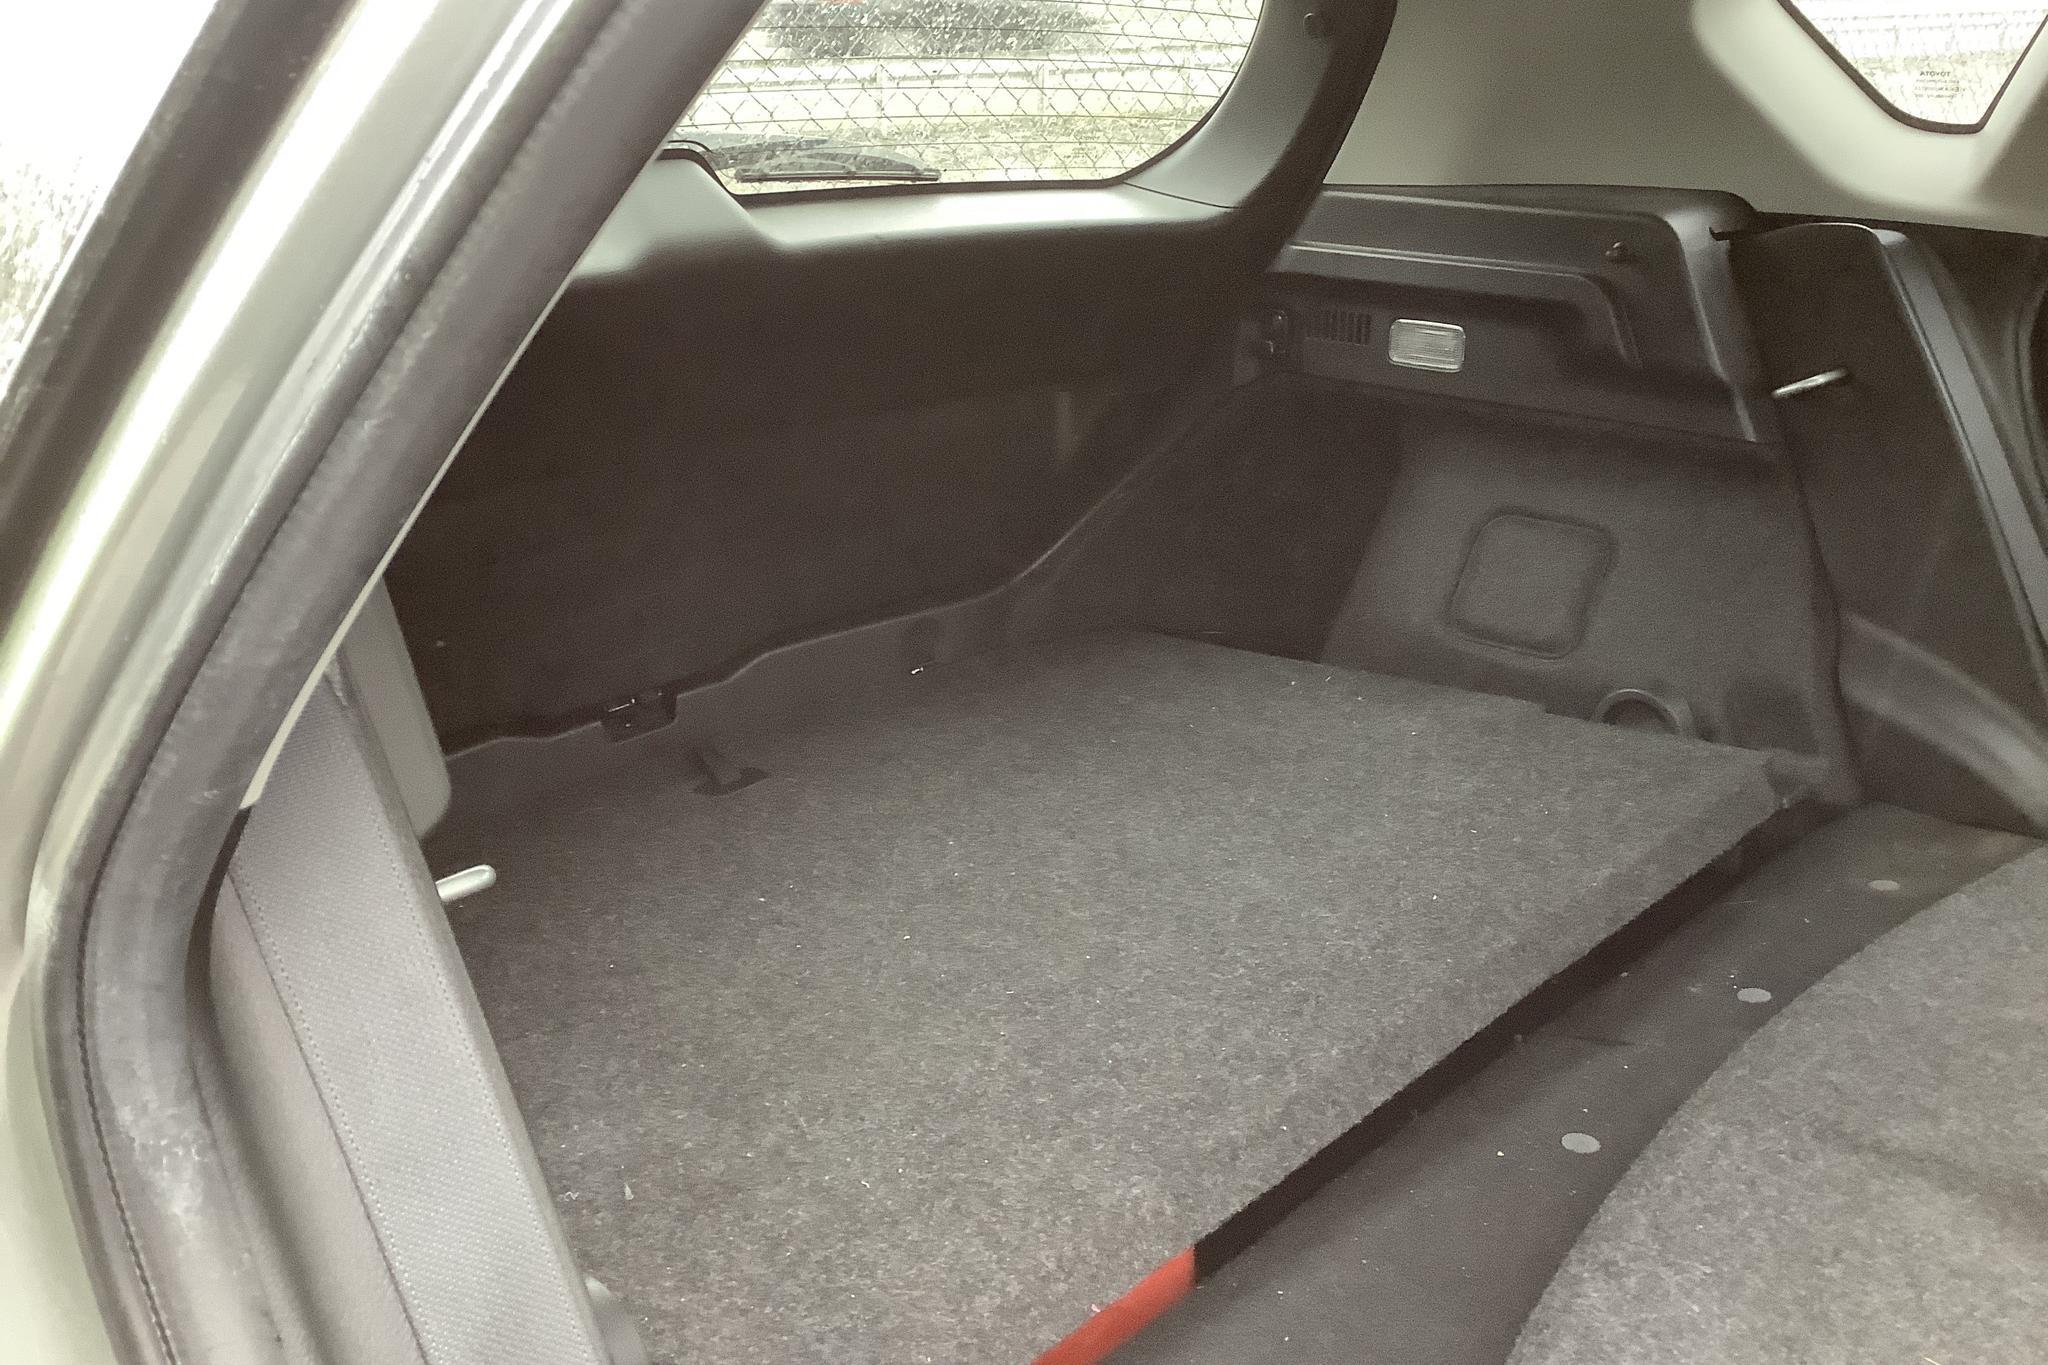 Toyota Auris 1.6 Valvematic 5dr (132hk) - 7 692 mil - Manuell - Light Grey - 2015